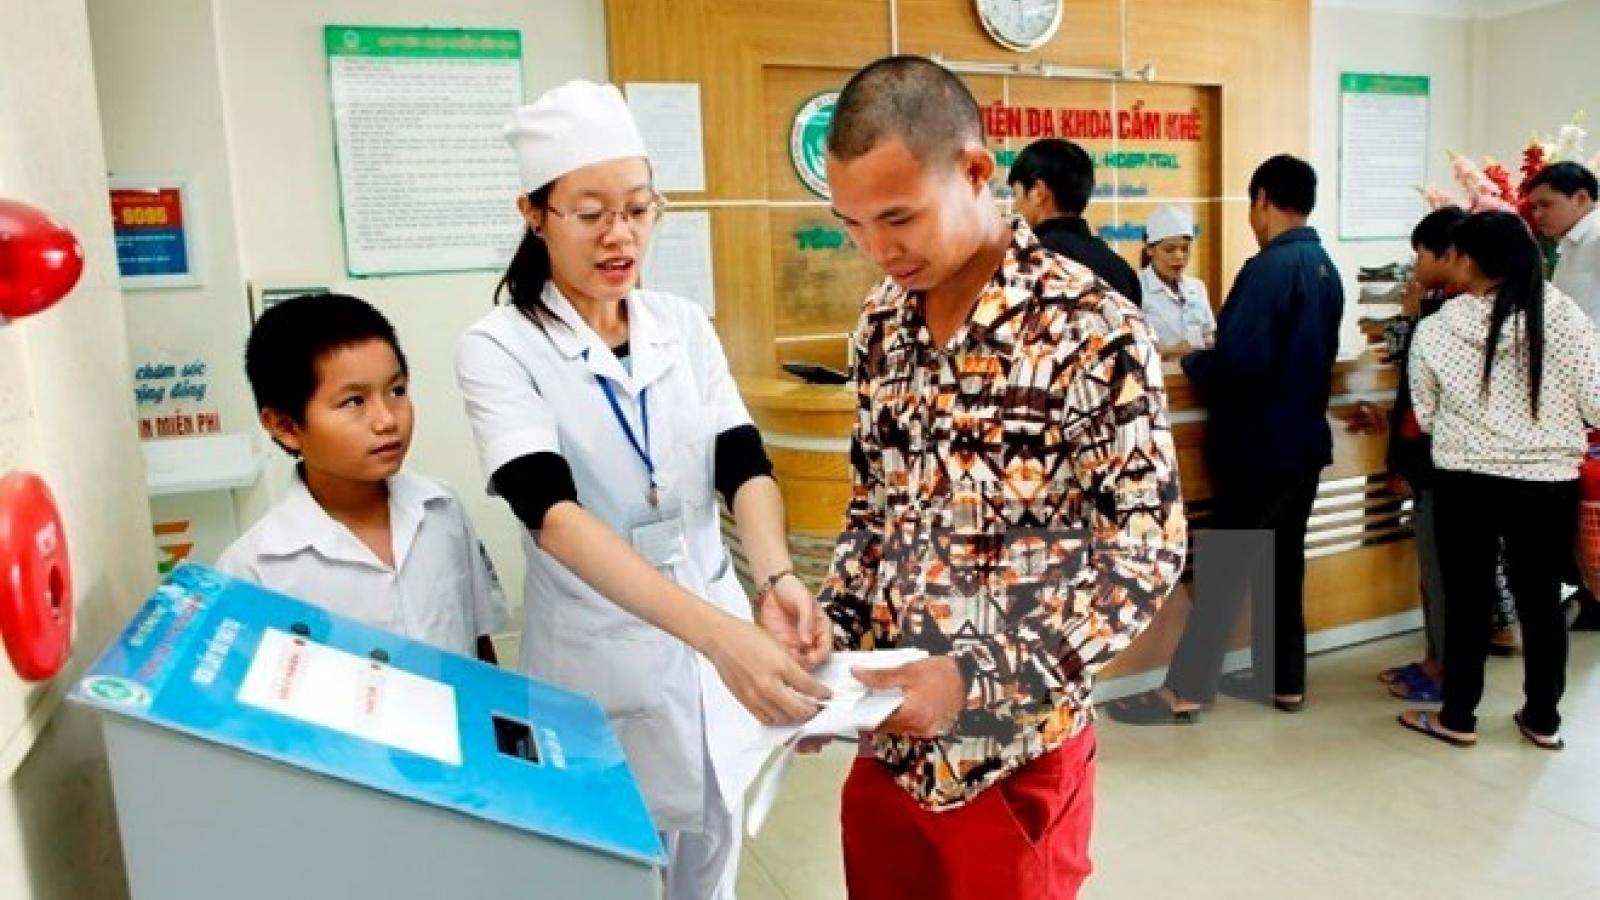 Deputy PM: Vietnam will not raise health insurance premiums until 2020